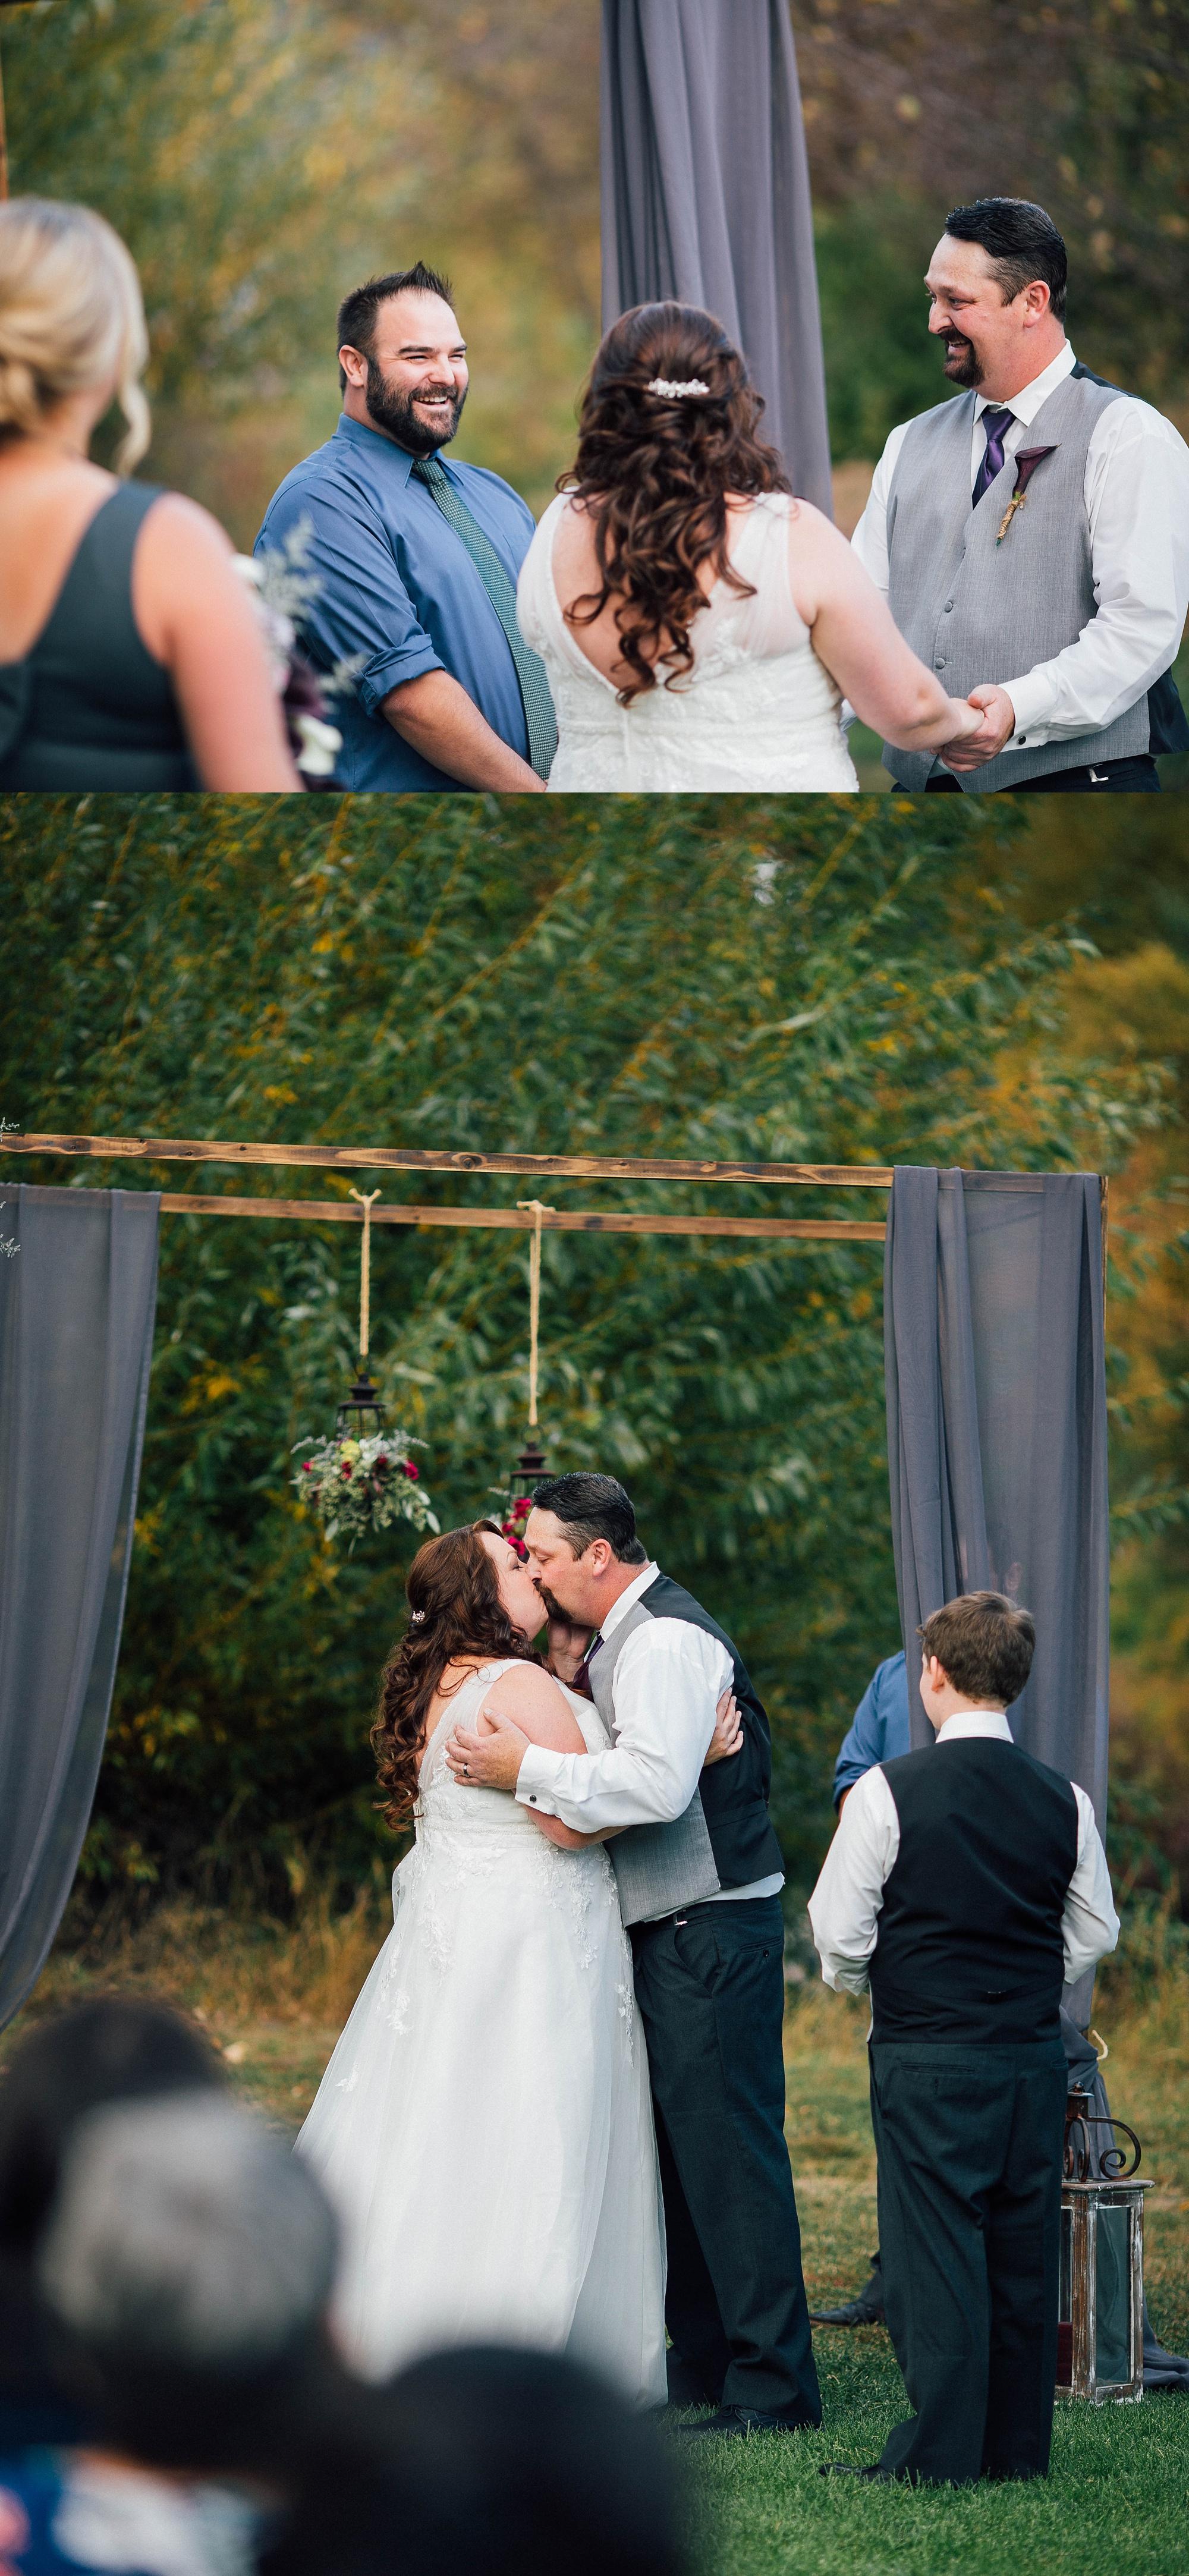 ashley_vos_seattle_ wedding_photographer_0233.jpg